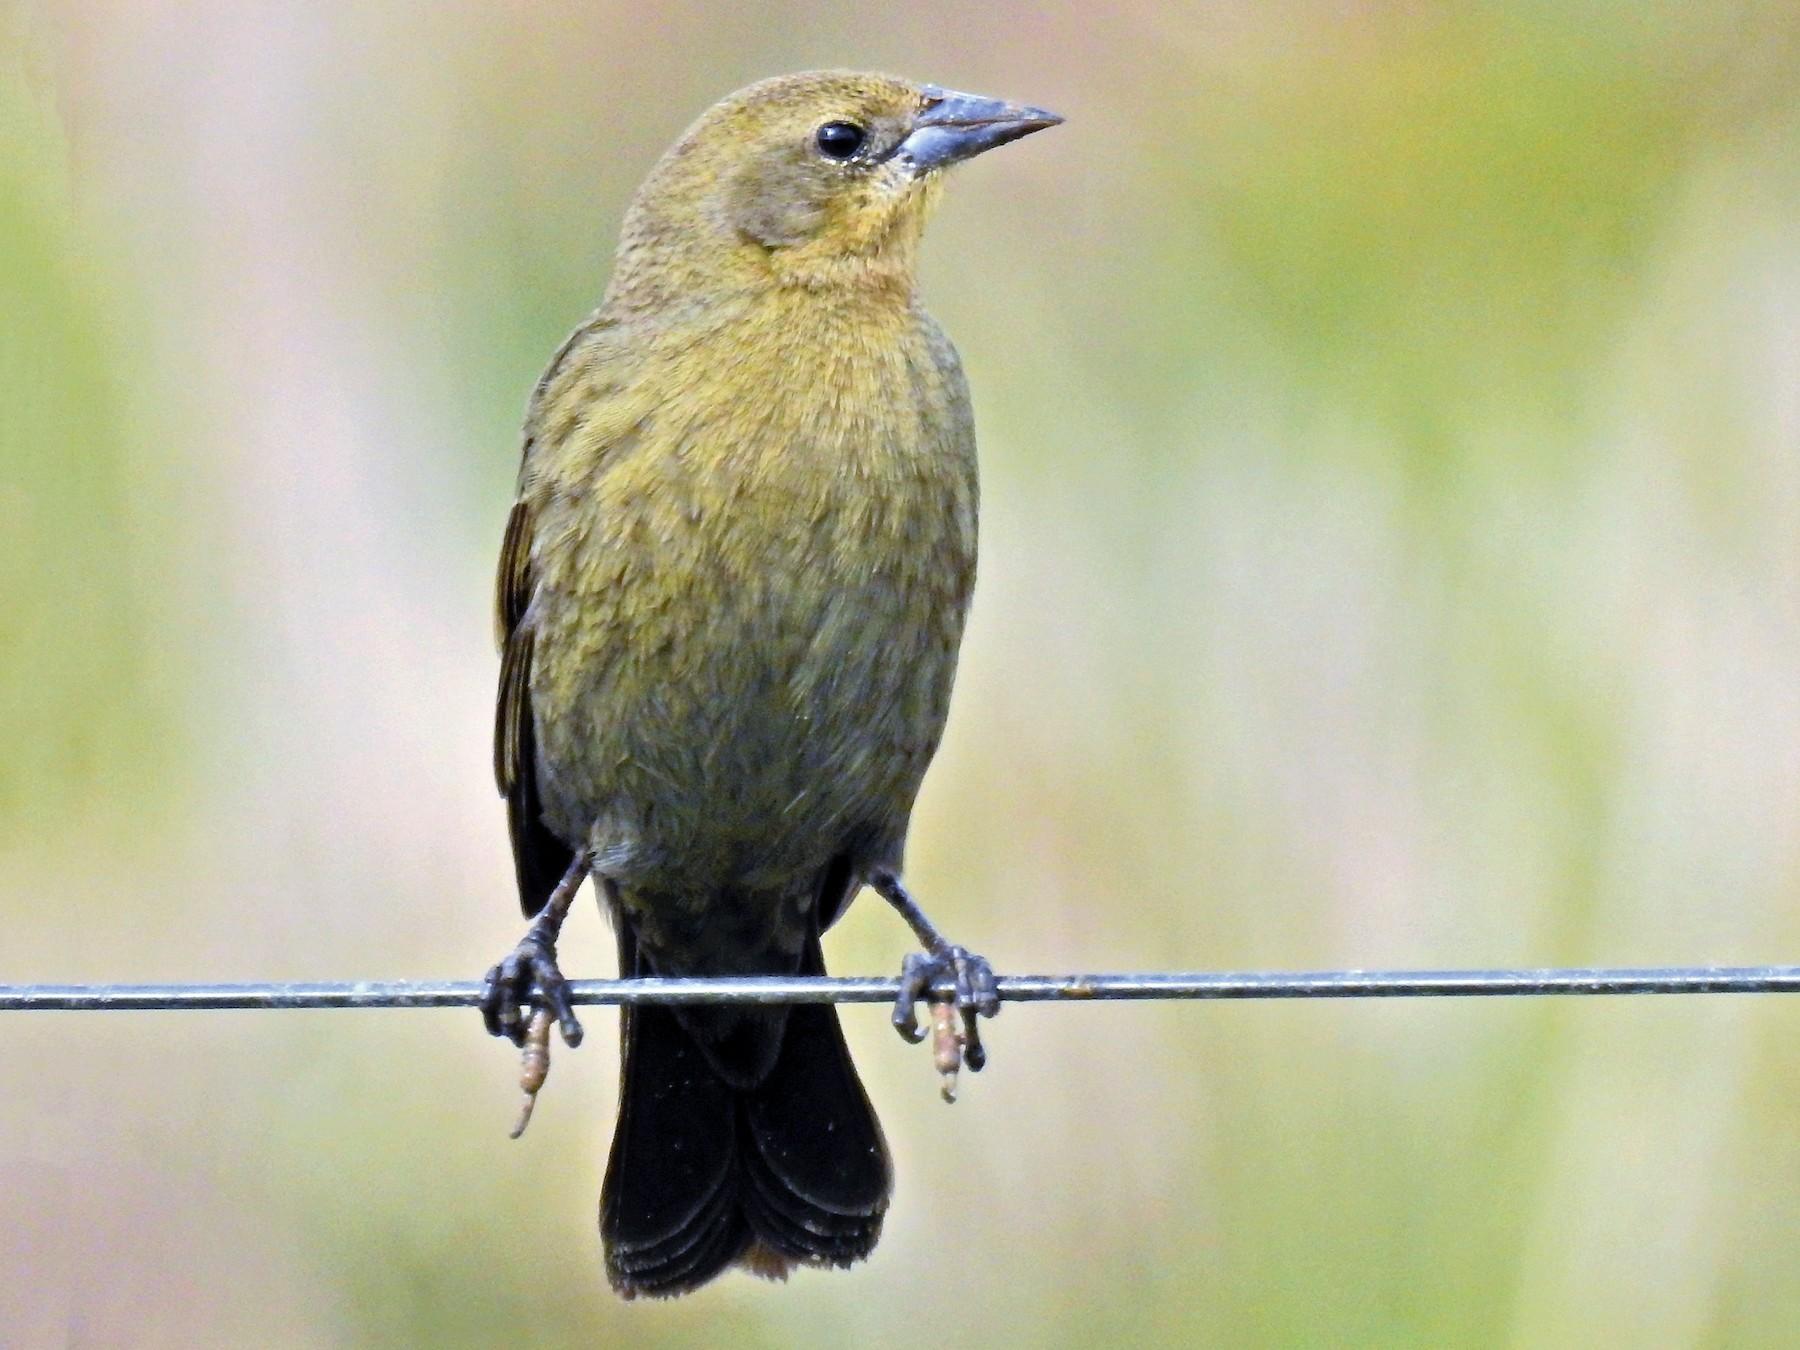 Chestnut-capped Blackbird - CLAUDIO JORGE FILHO